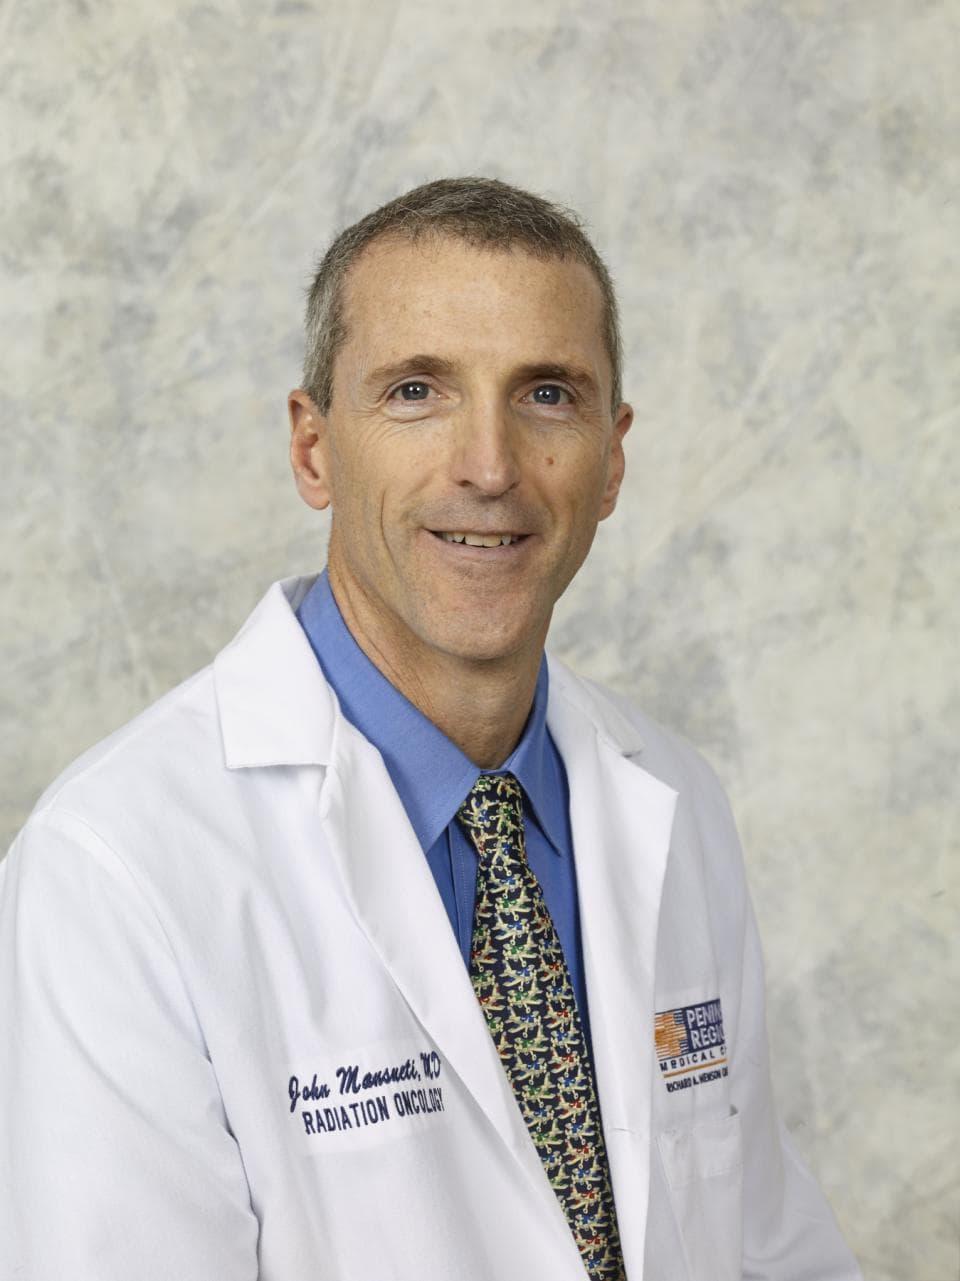 Dr. John R Mansueti MD